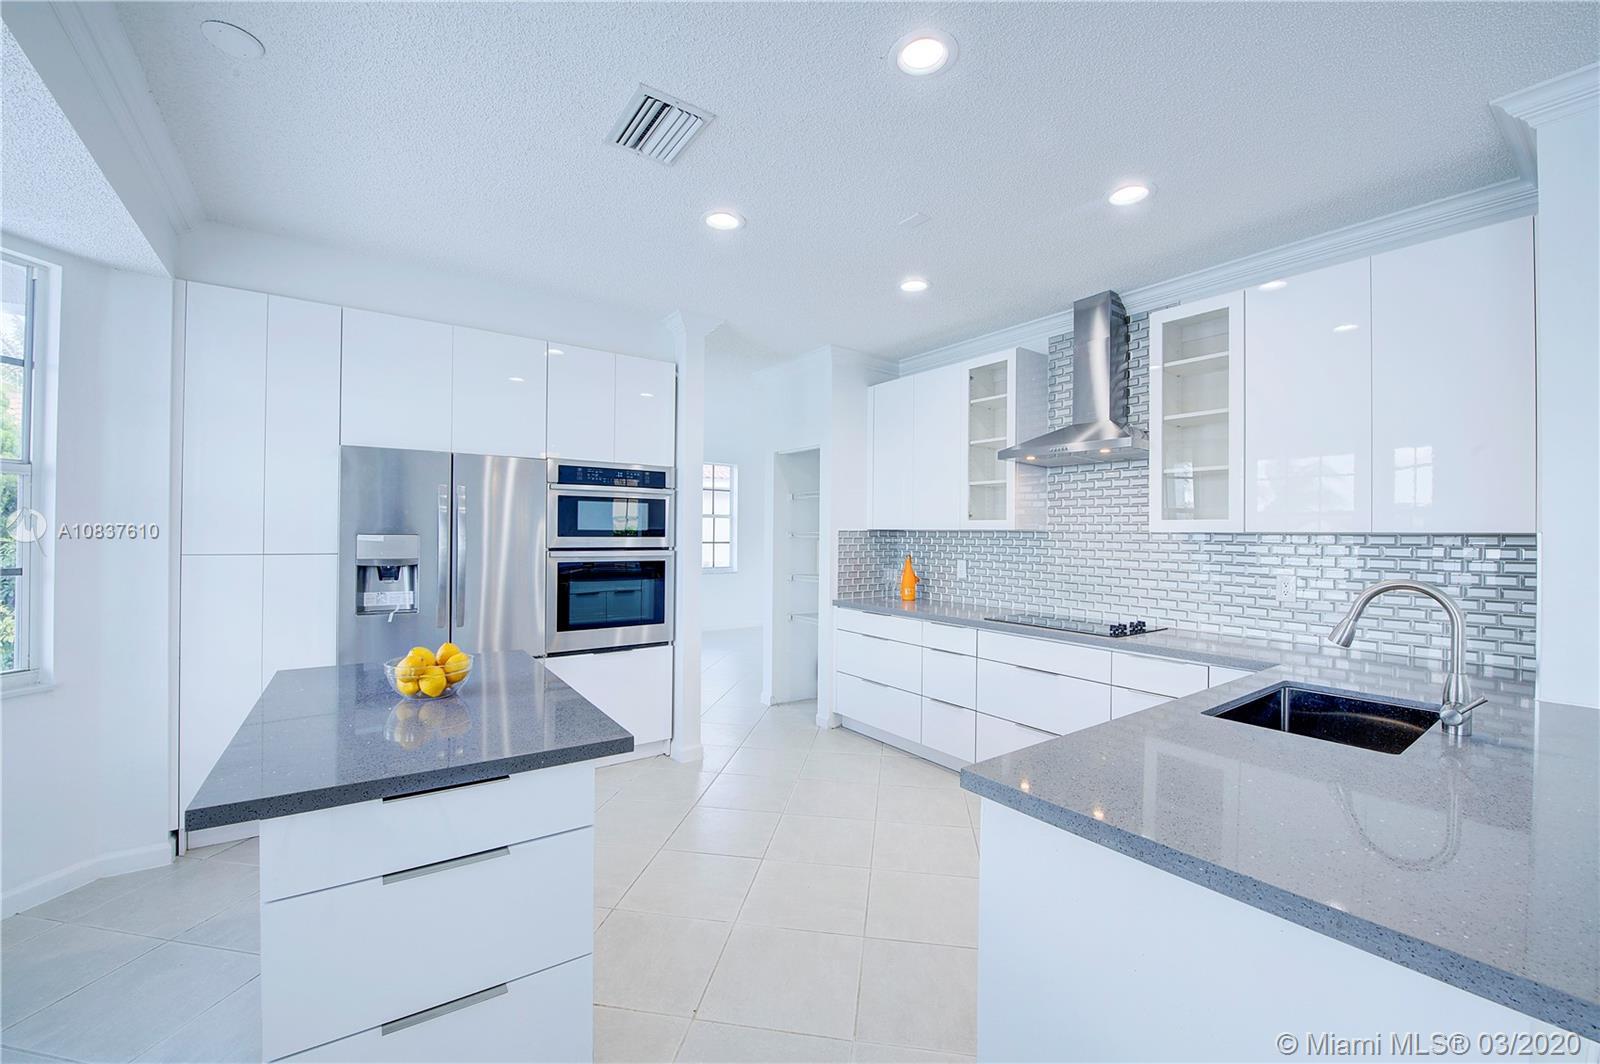 1172 Falls Blvd, Weston, Florida 33327, 5 Bedrooms Bedrooms, 8 Rooms Rooms,4 BathroomsBathrooms,Residential,For Sale,1172 Falls Blvd,A10837610